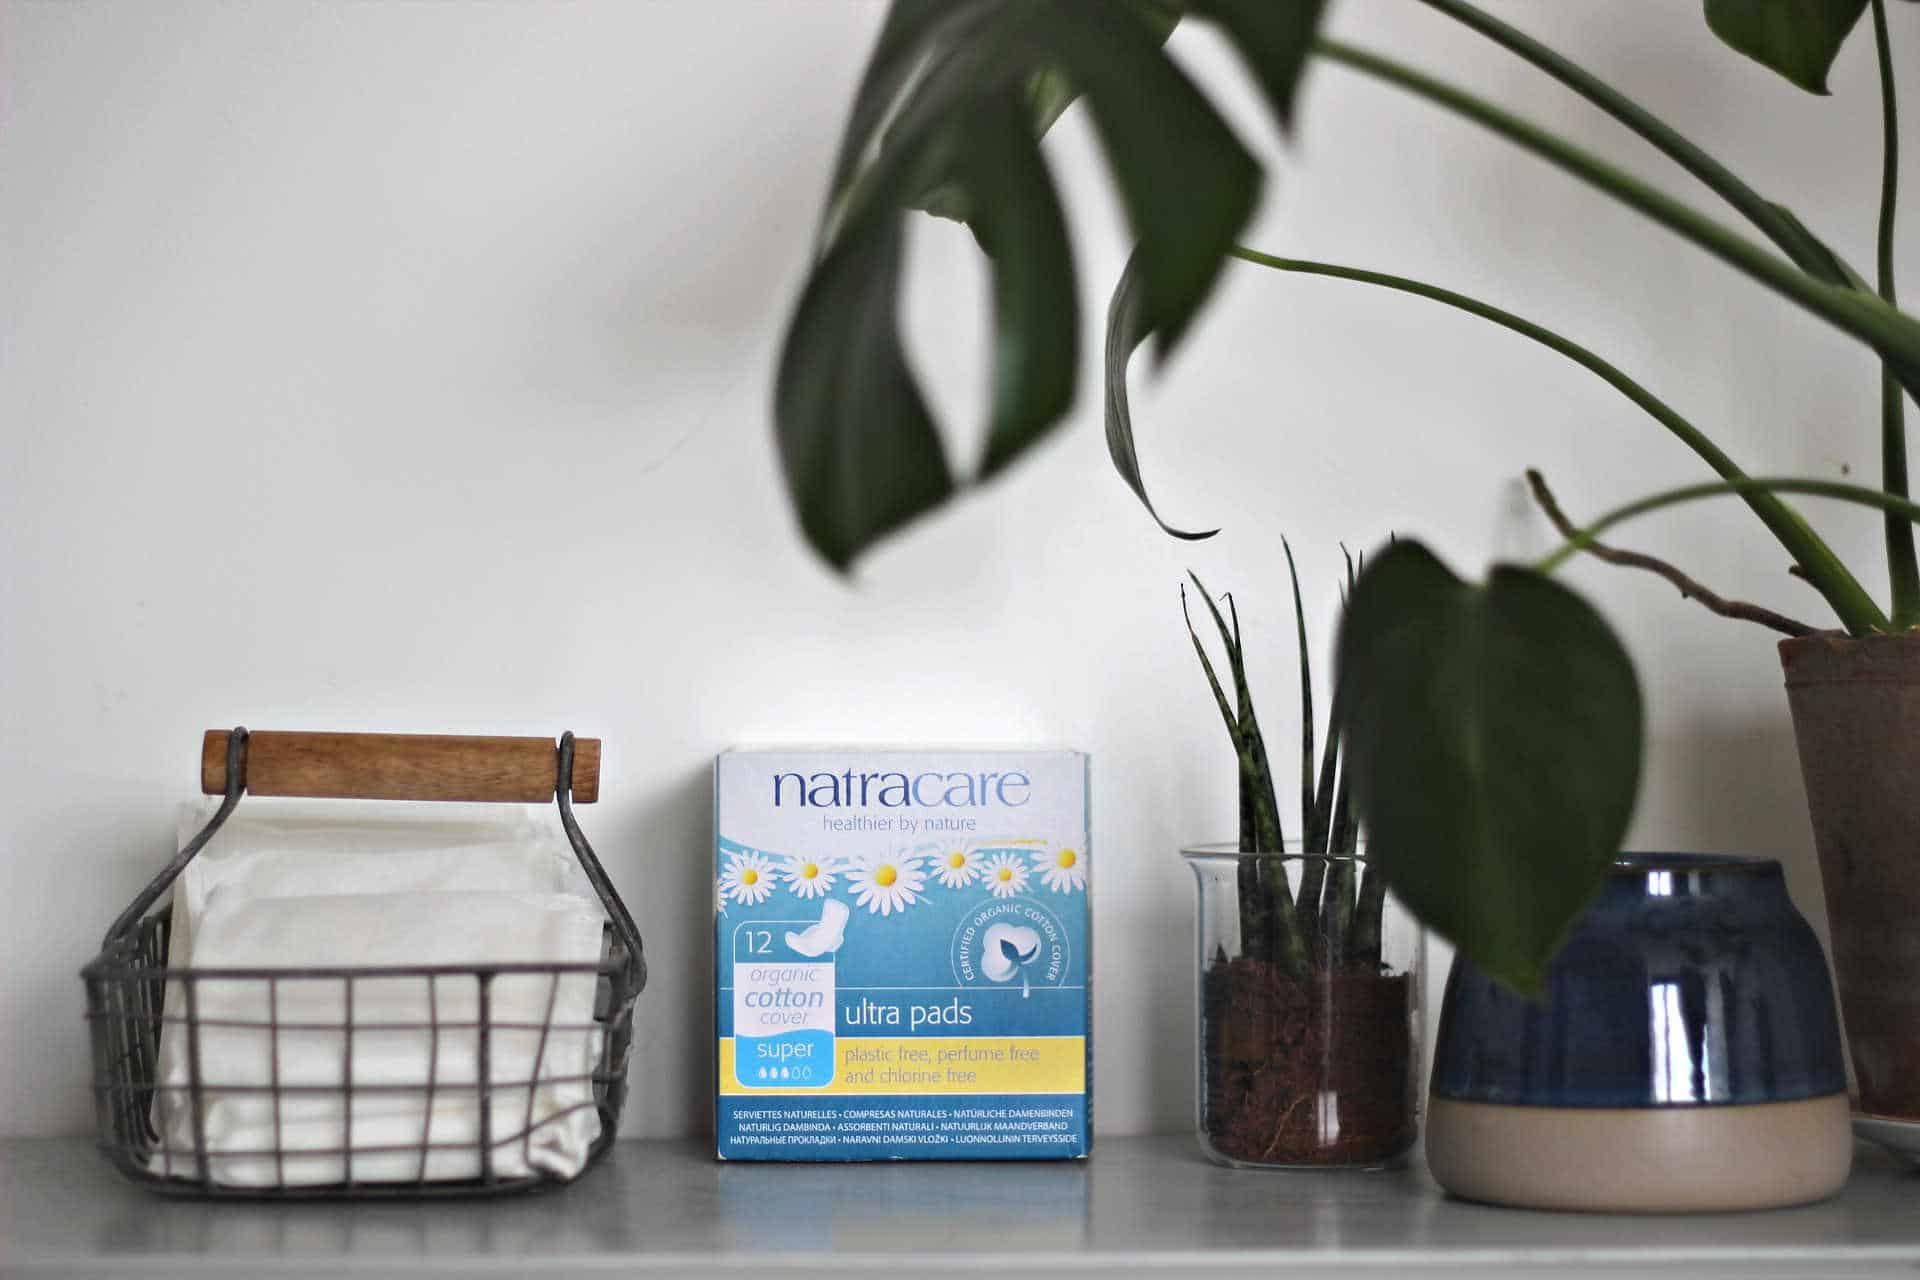 natracare eco-friendly sanitary towels